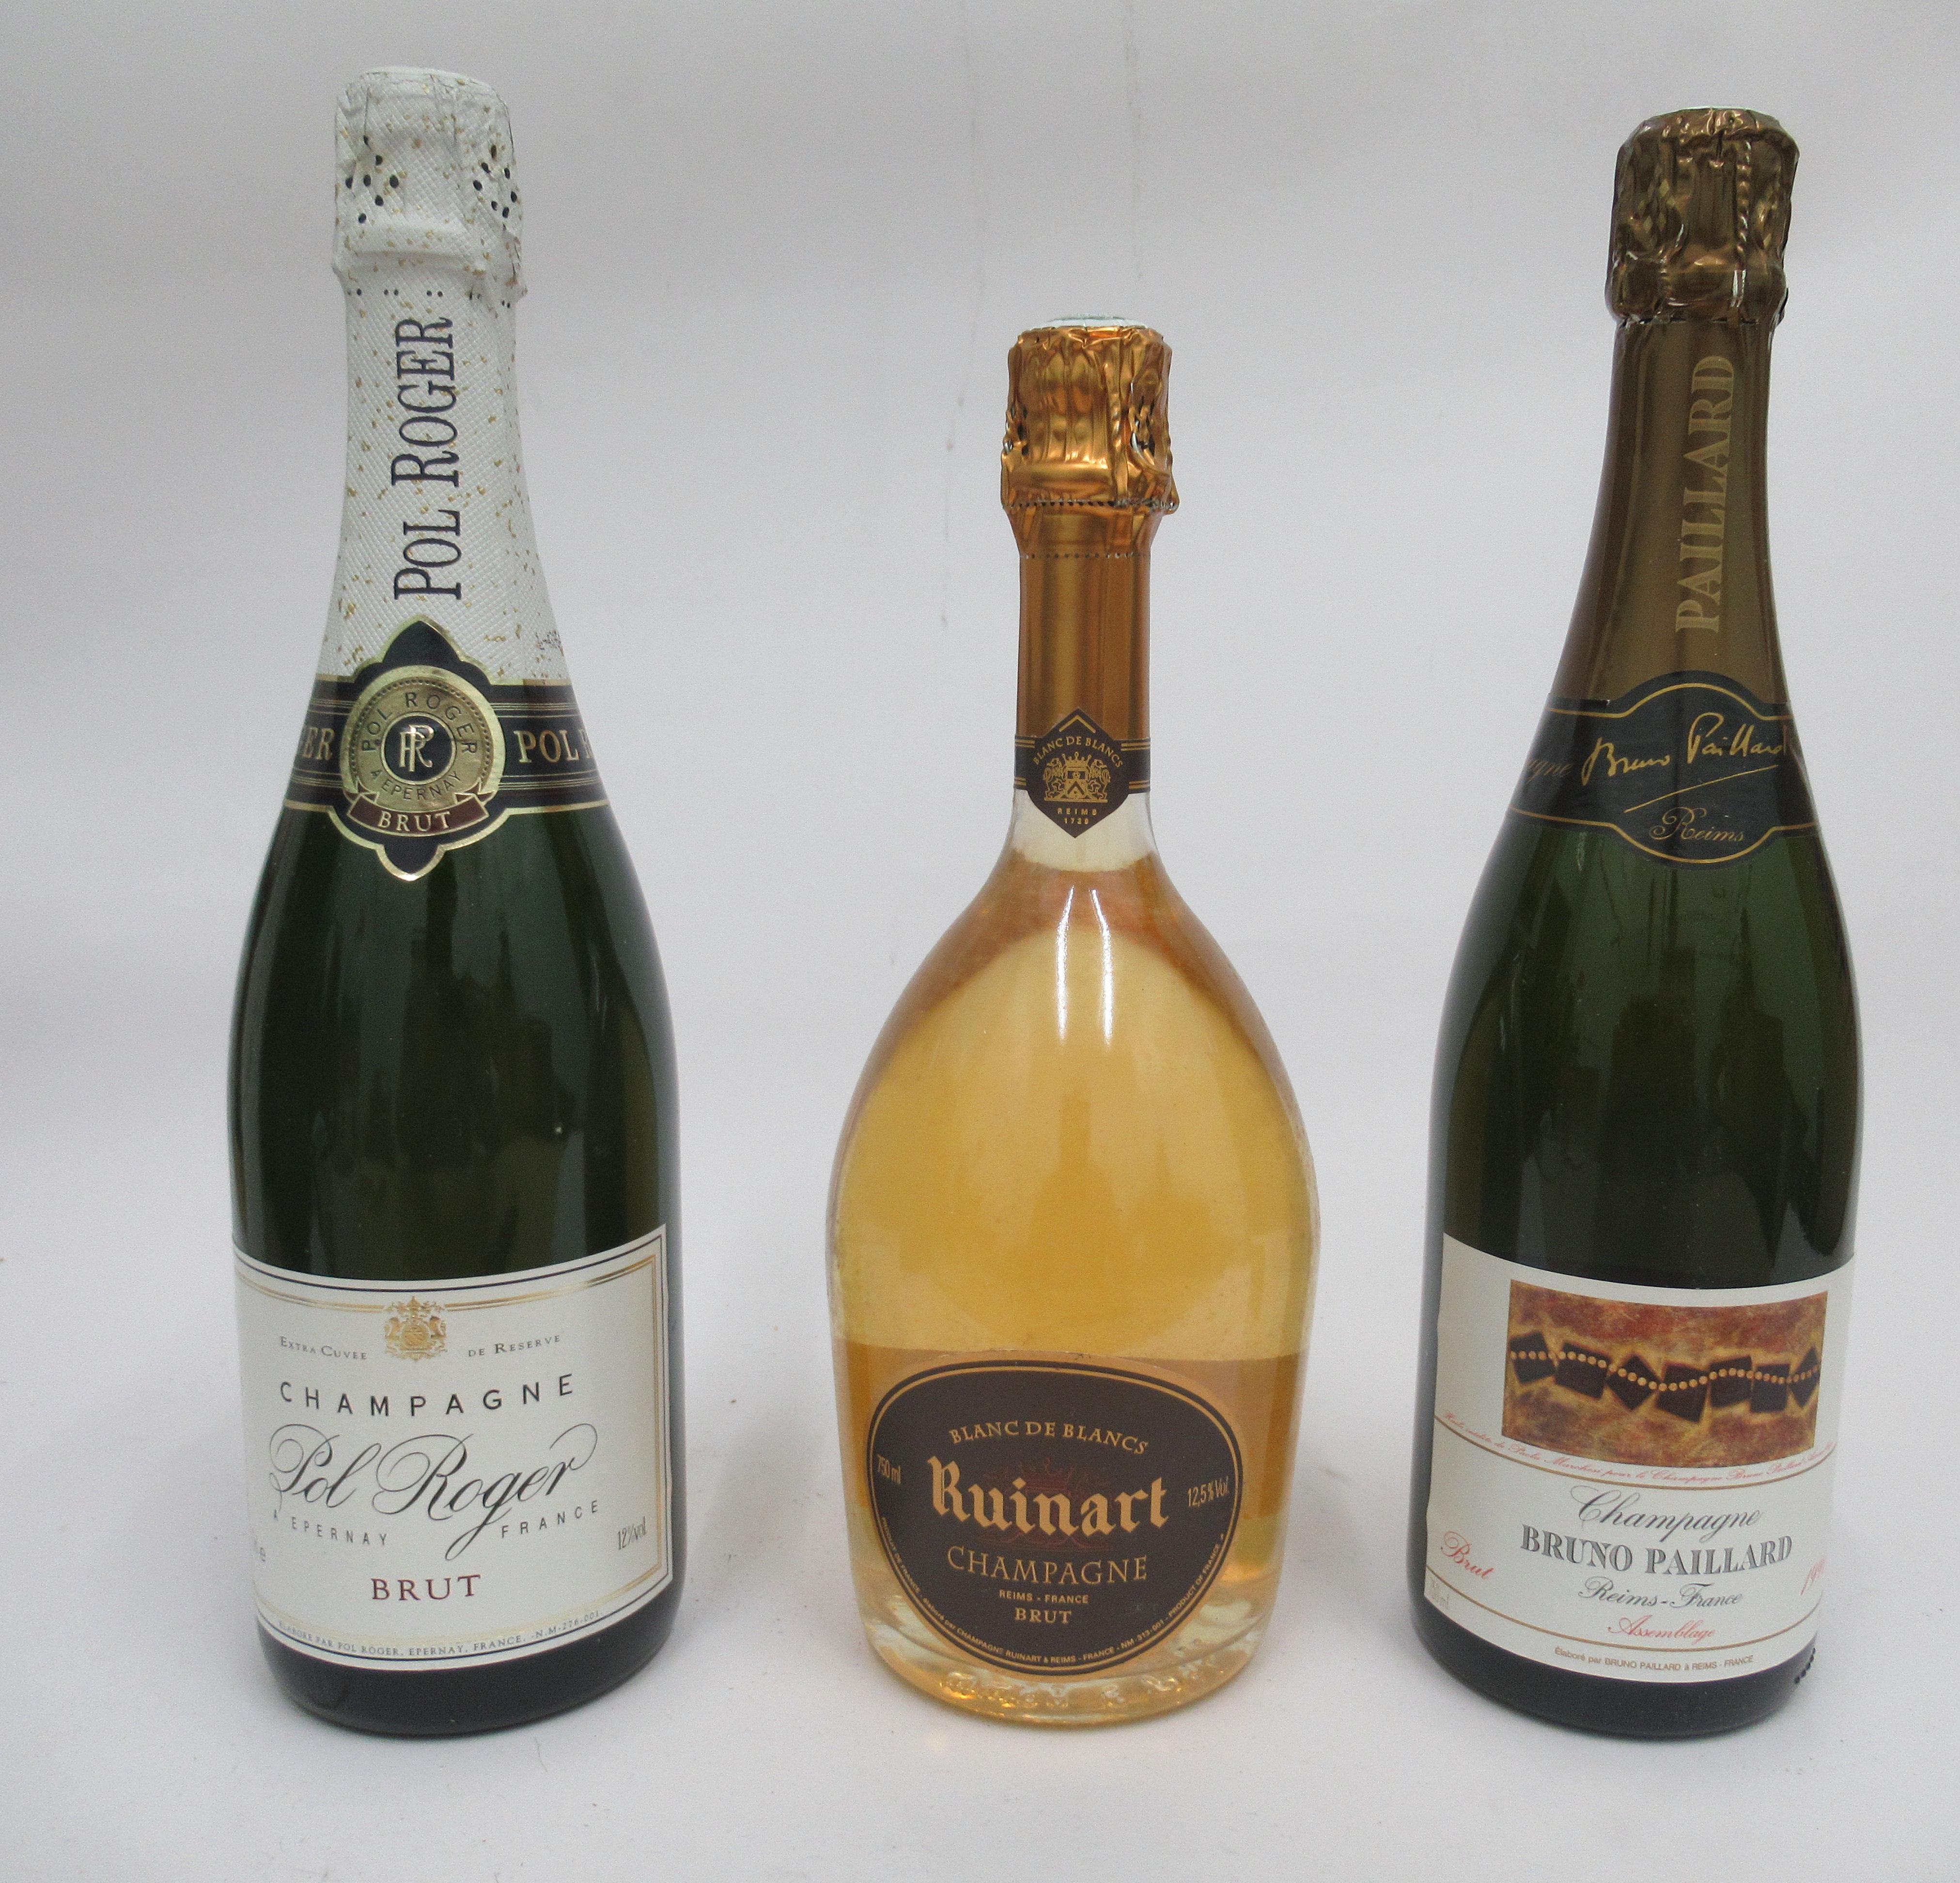 Wine, Champagne, viz. a Pol Roger; a Ruinart Blanc de Blancs; and a 1996 Bruno Paillard each boxed - Image 2 of 6